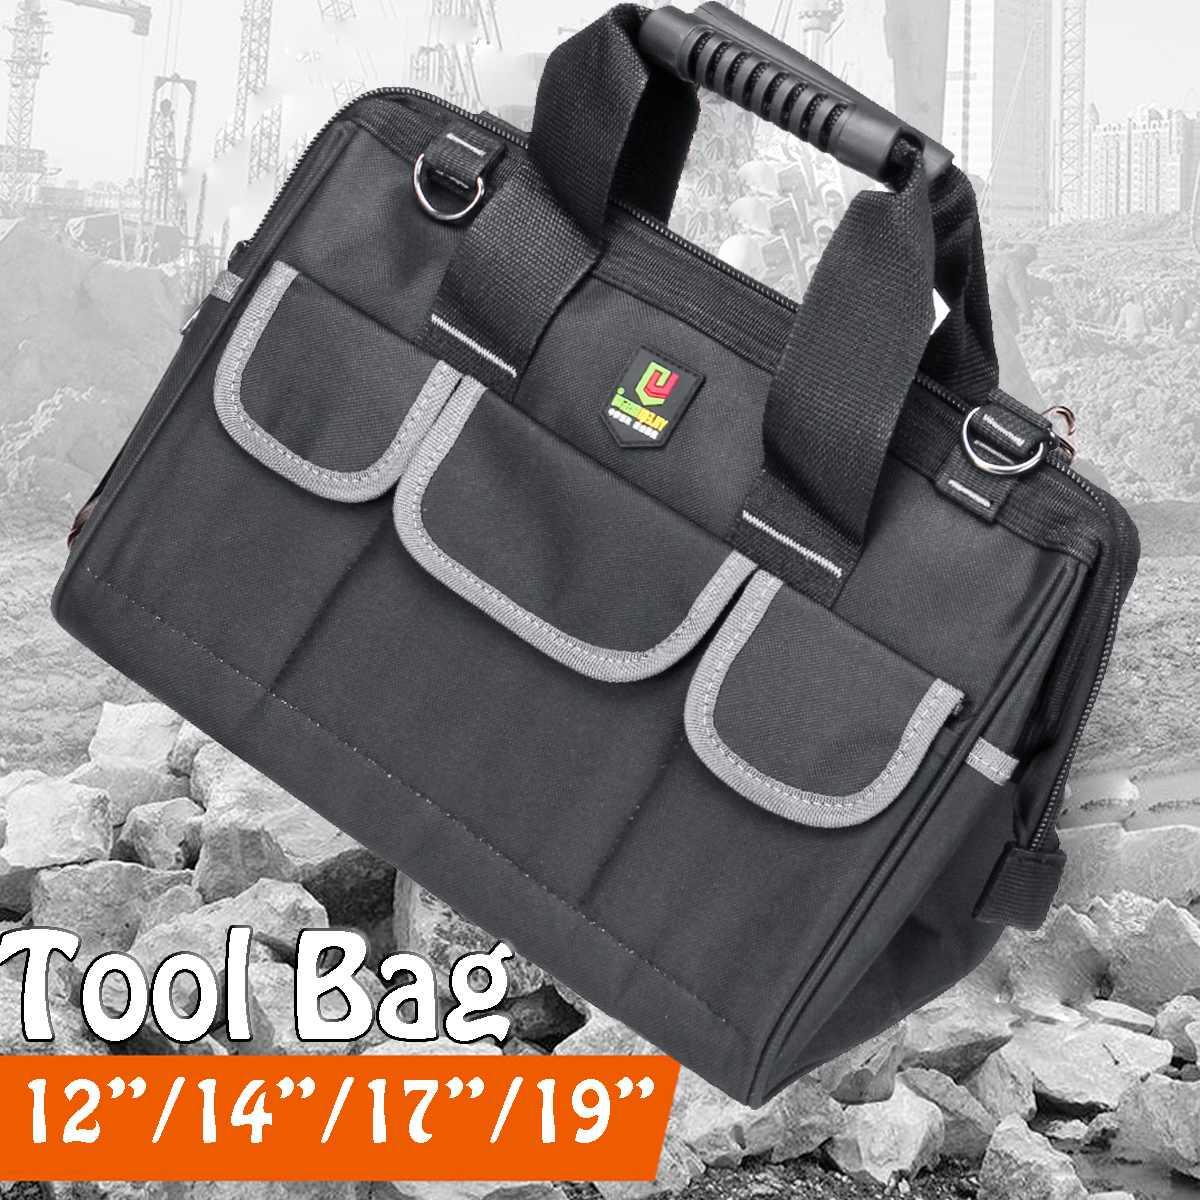 Heavy Duty Tool Bag Cas portable Oxford Cloth Hardware Pouch